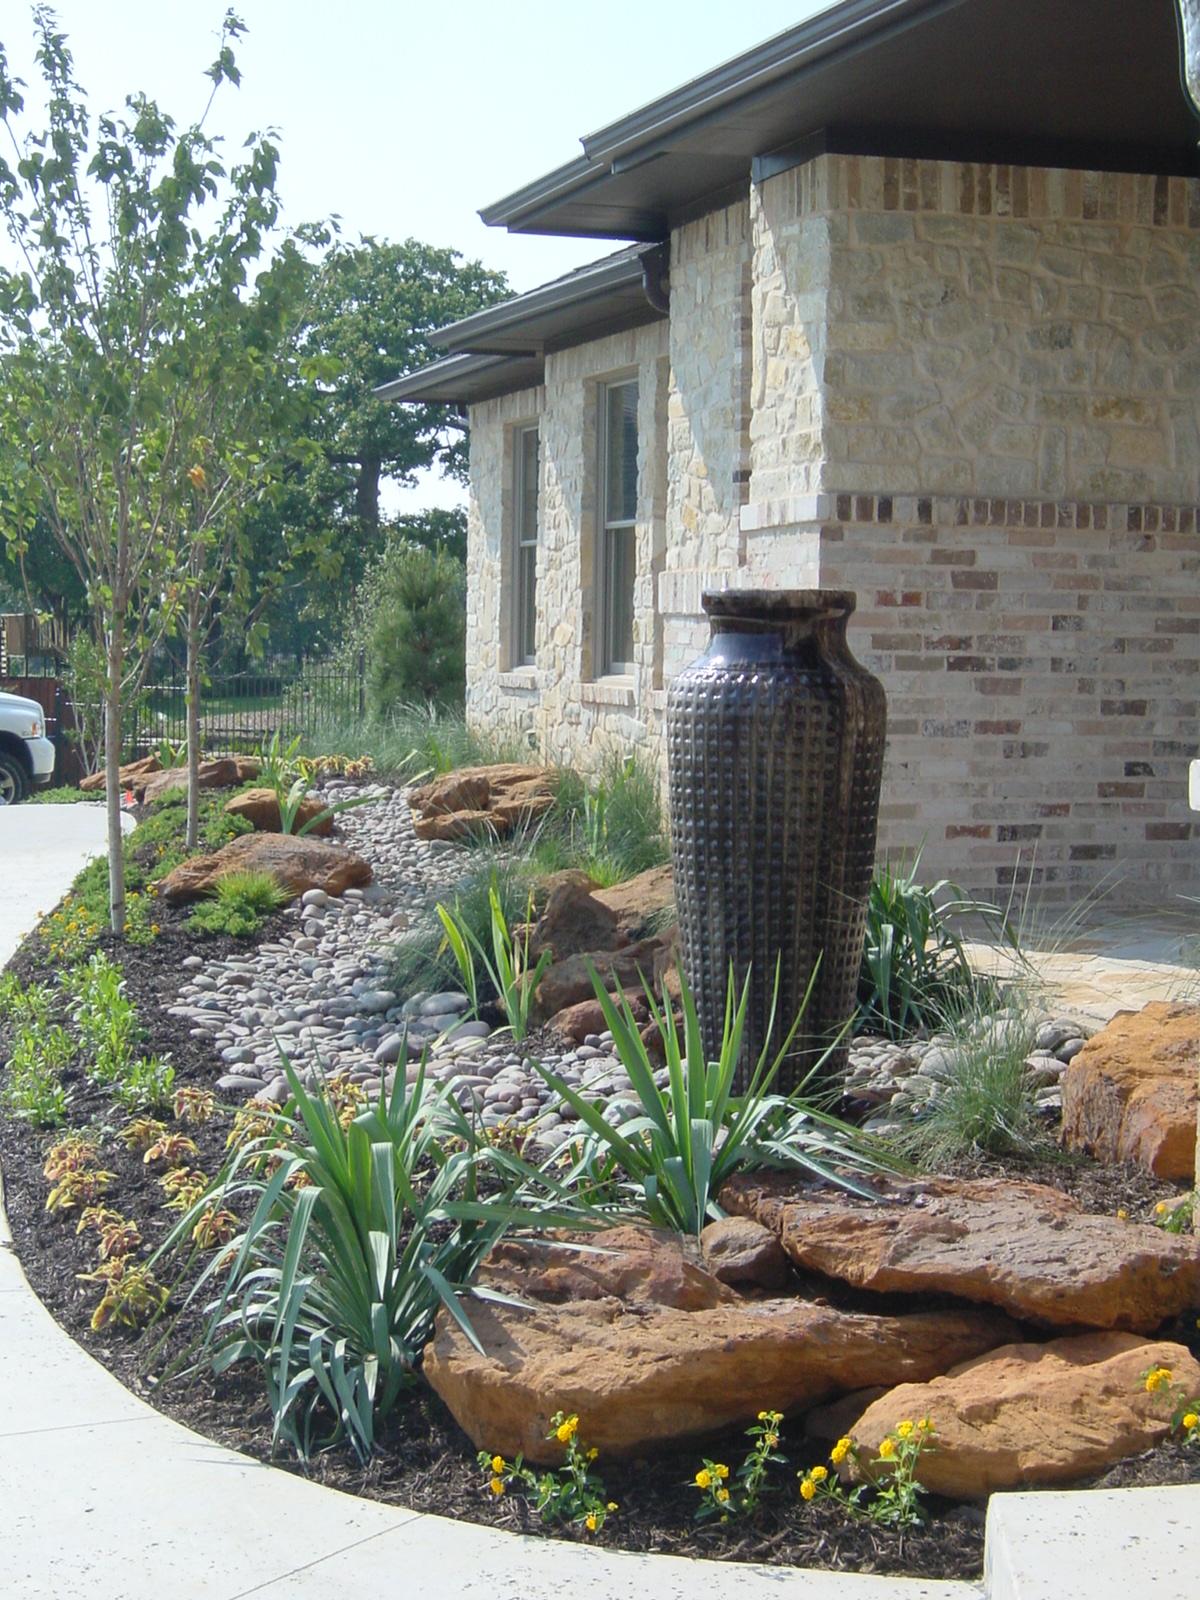 Custom Landscape Design Flowermound Texas   Small boulders ... on Landscape Design Small Area id=39601